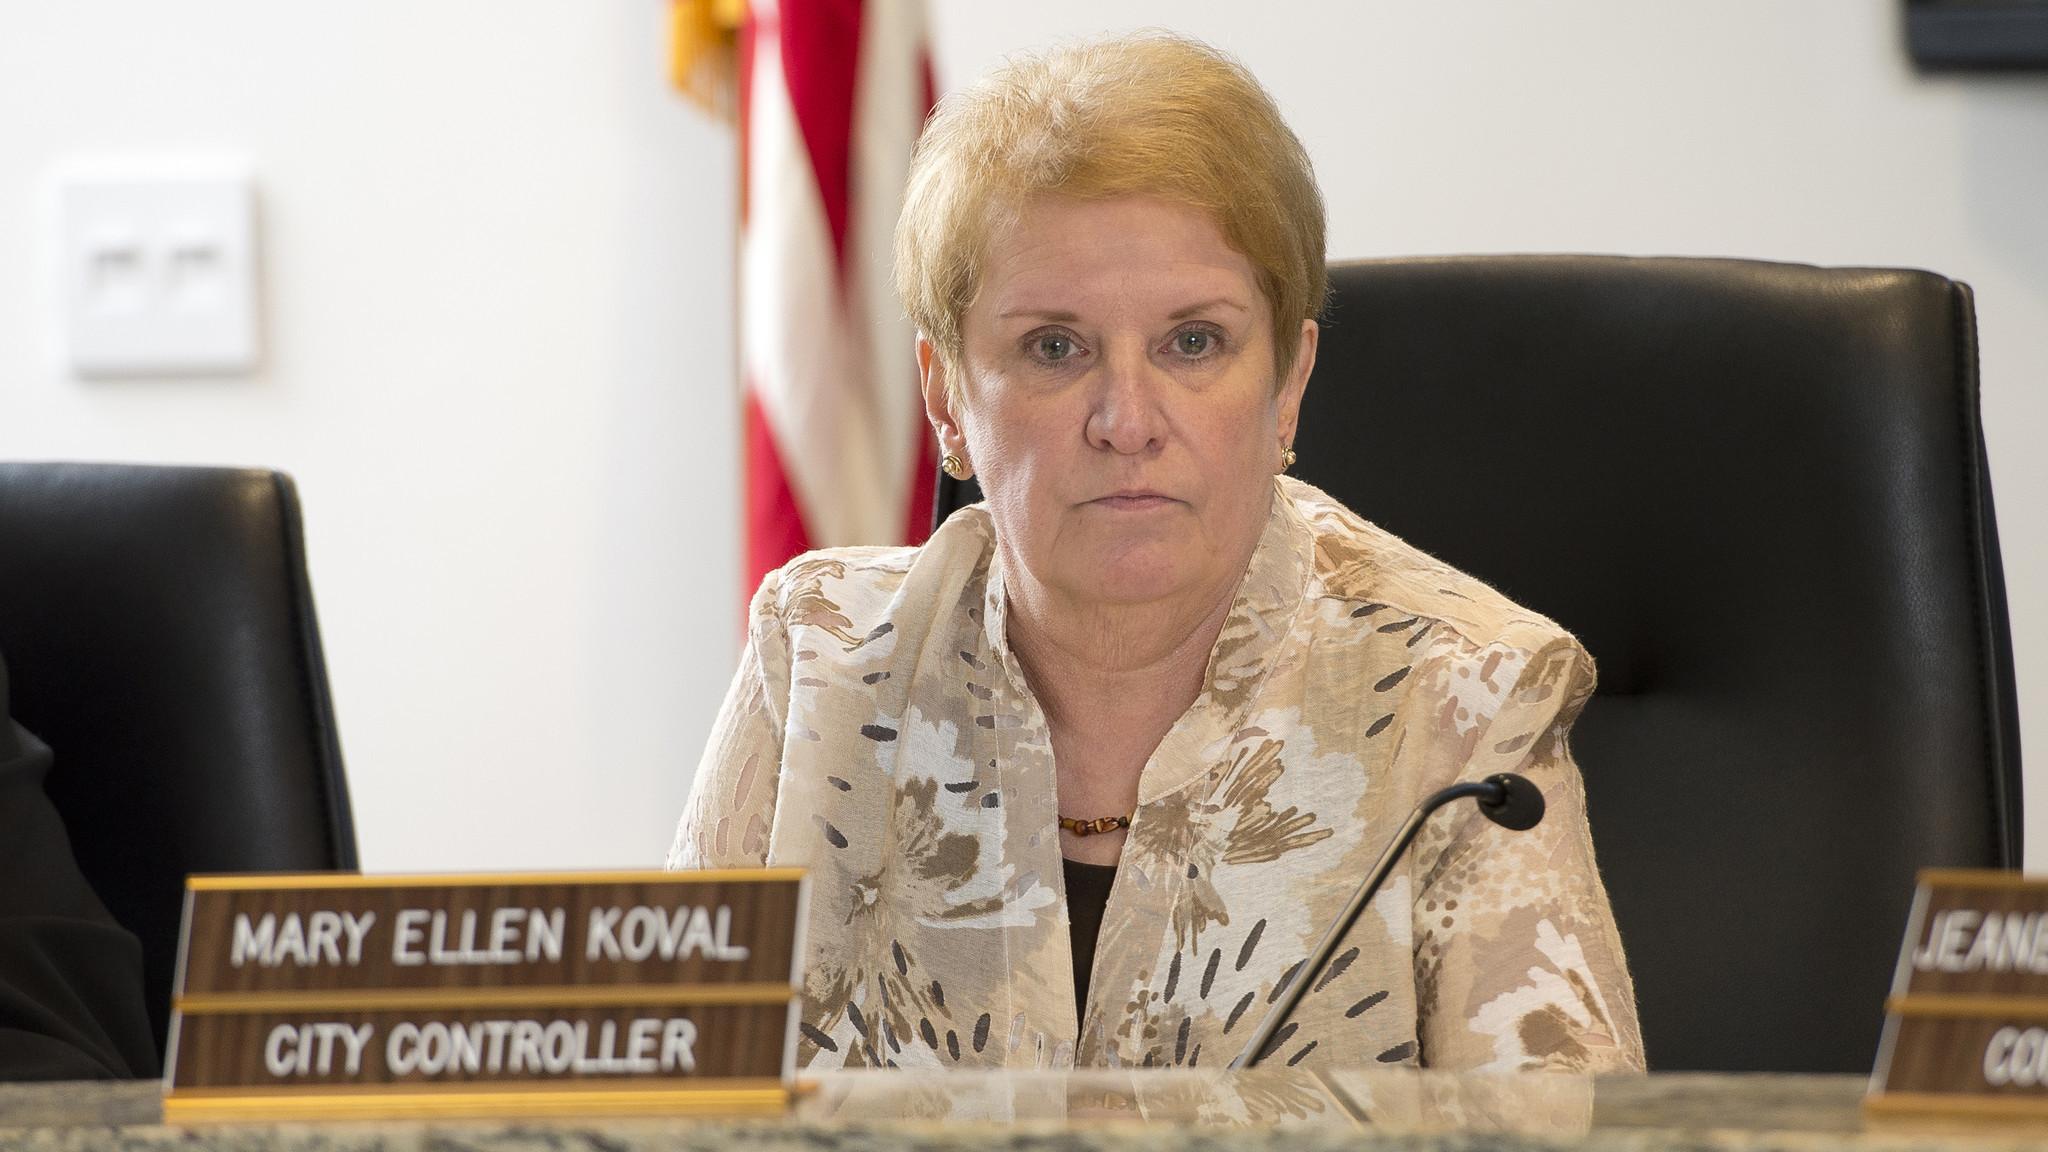 Mary Ellen Koval